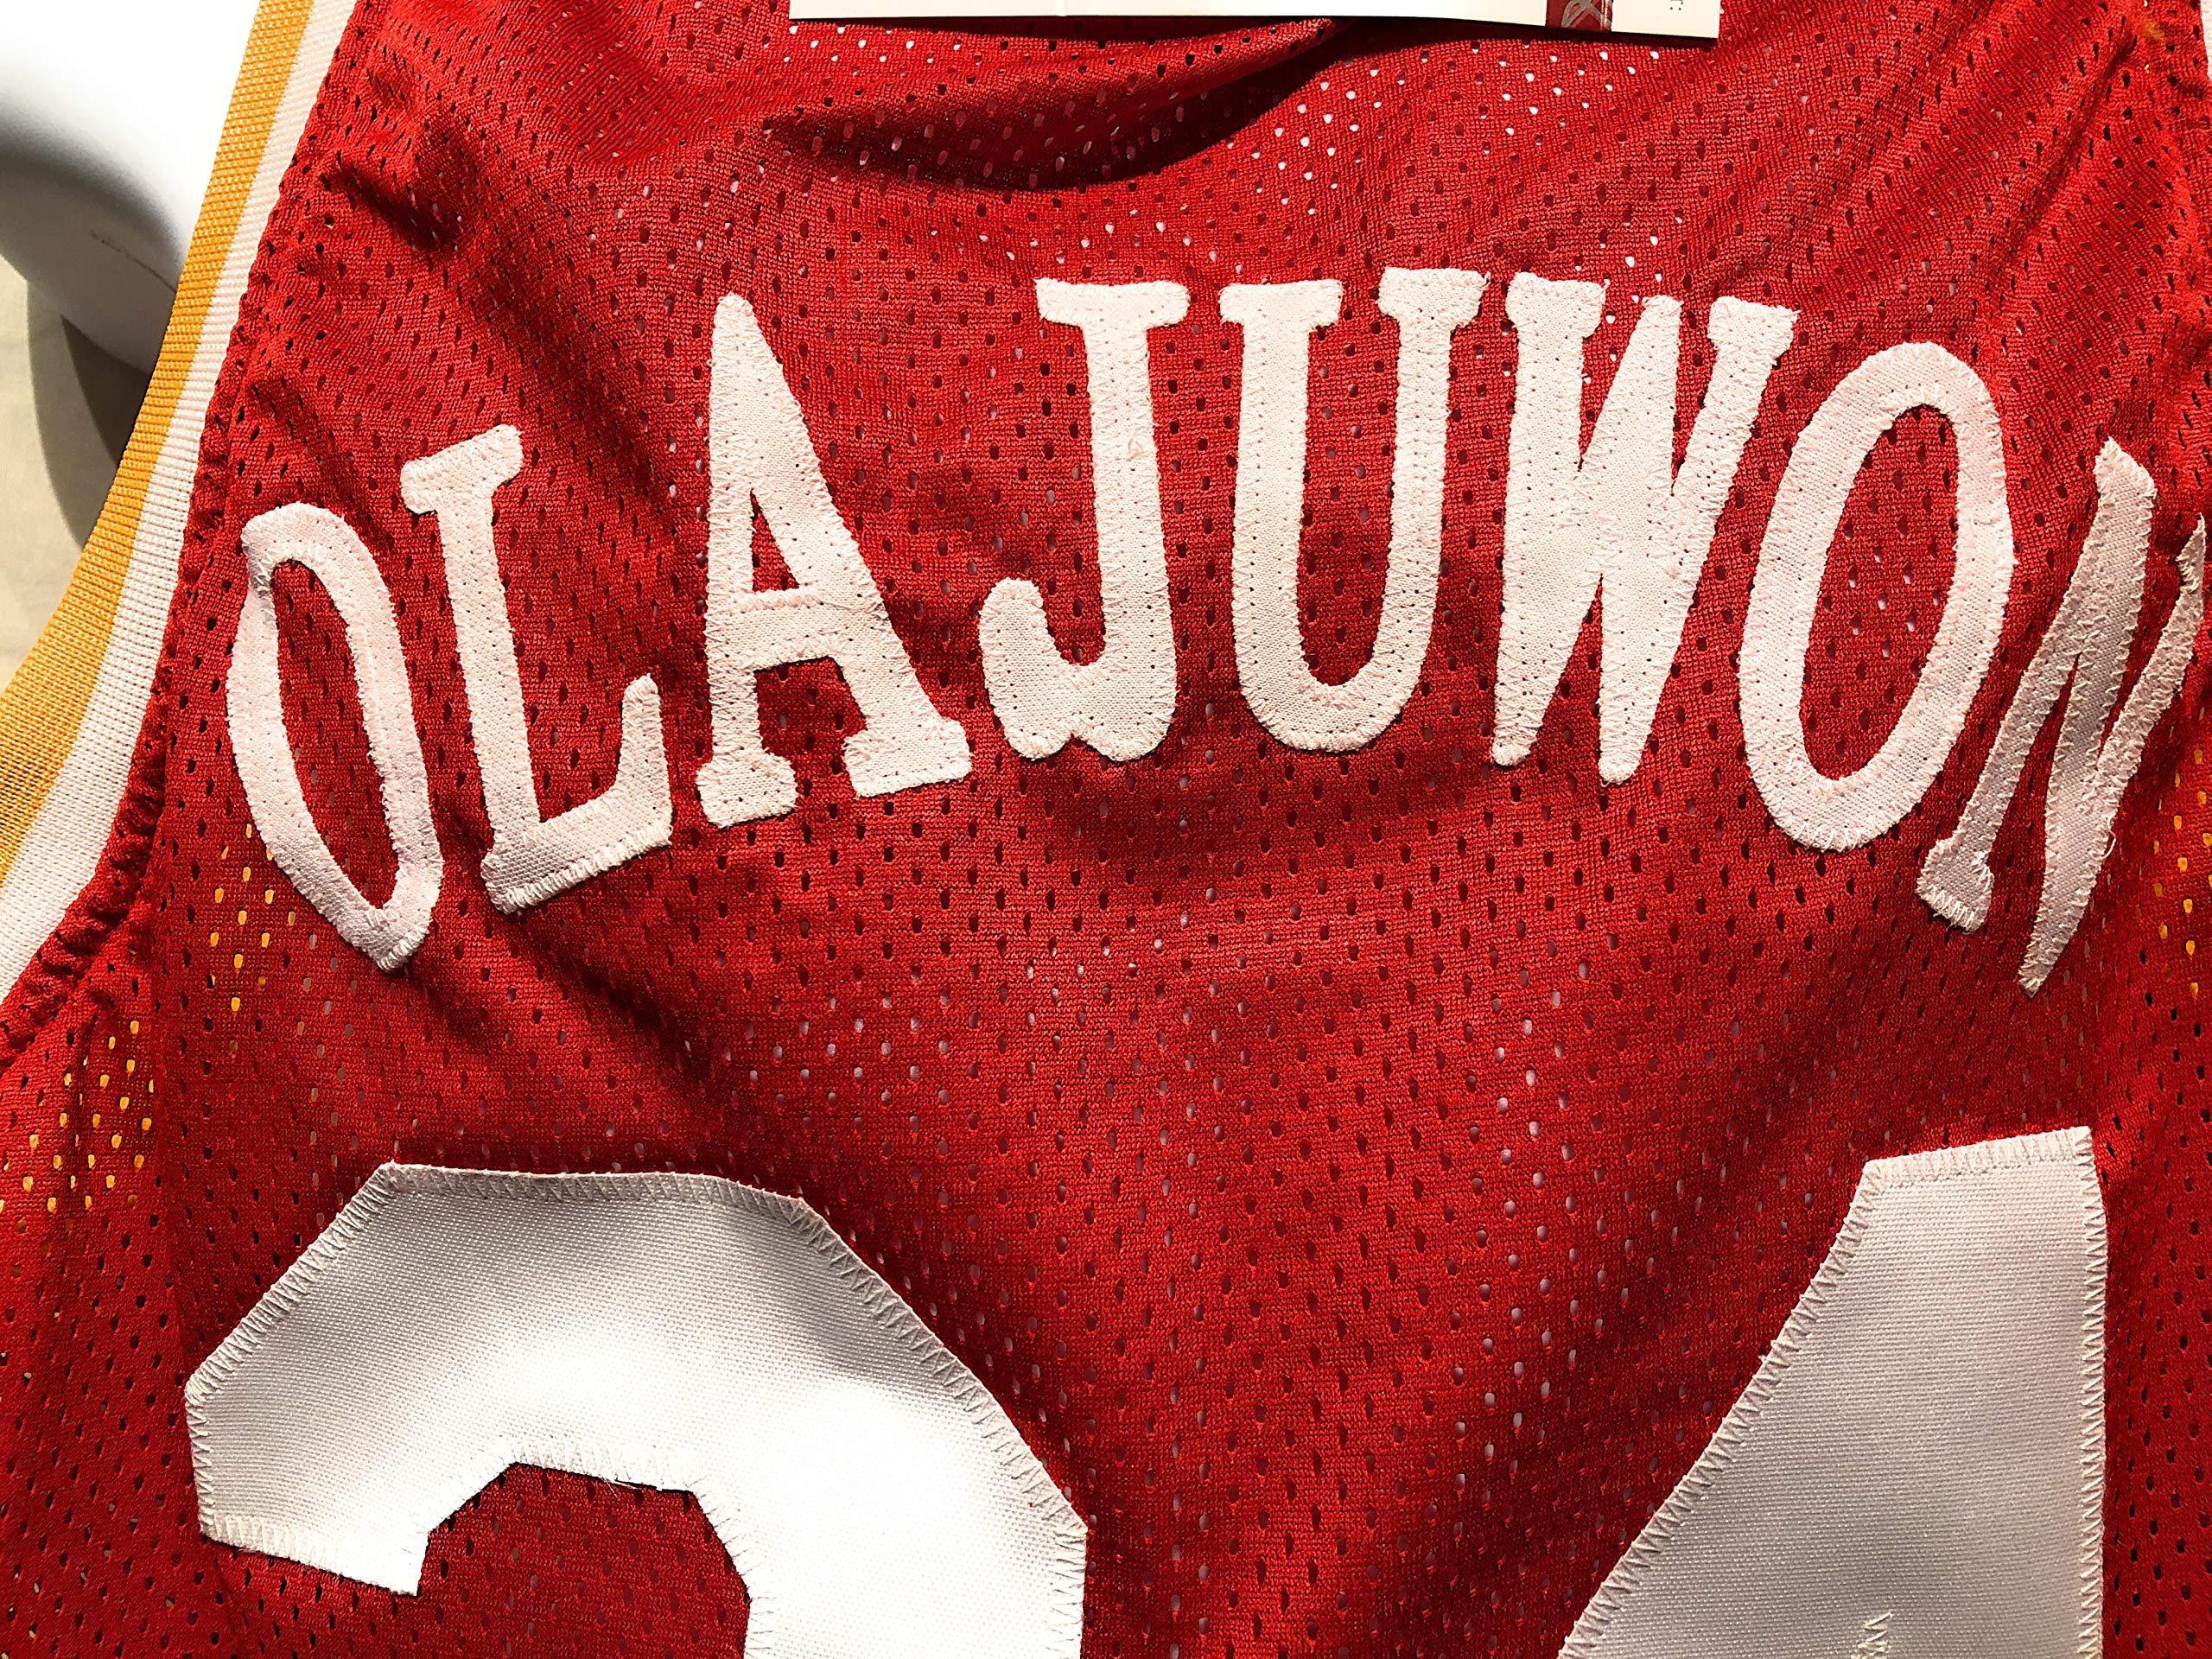 c04039bef Hakeem Olajuwon Houston Rockets Signed Autograph Custom Jersey JSA Witnessed  Certified